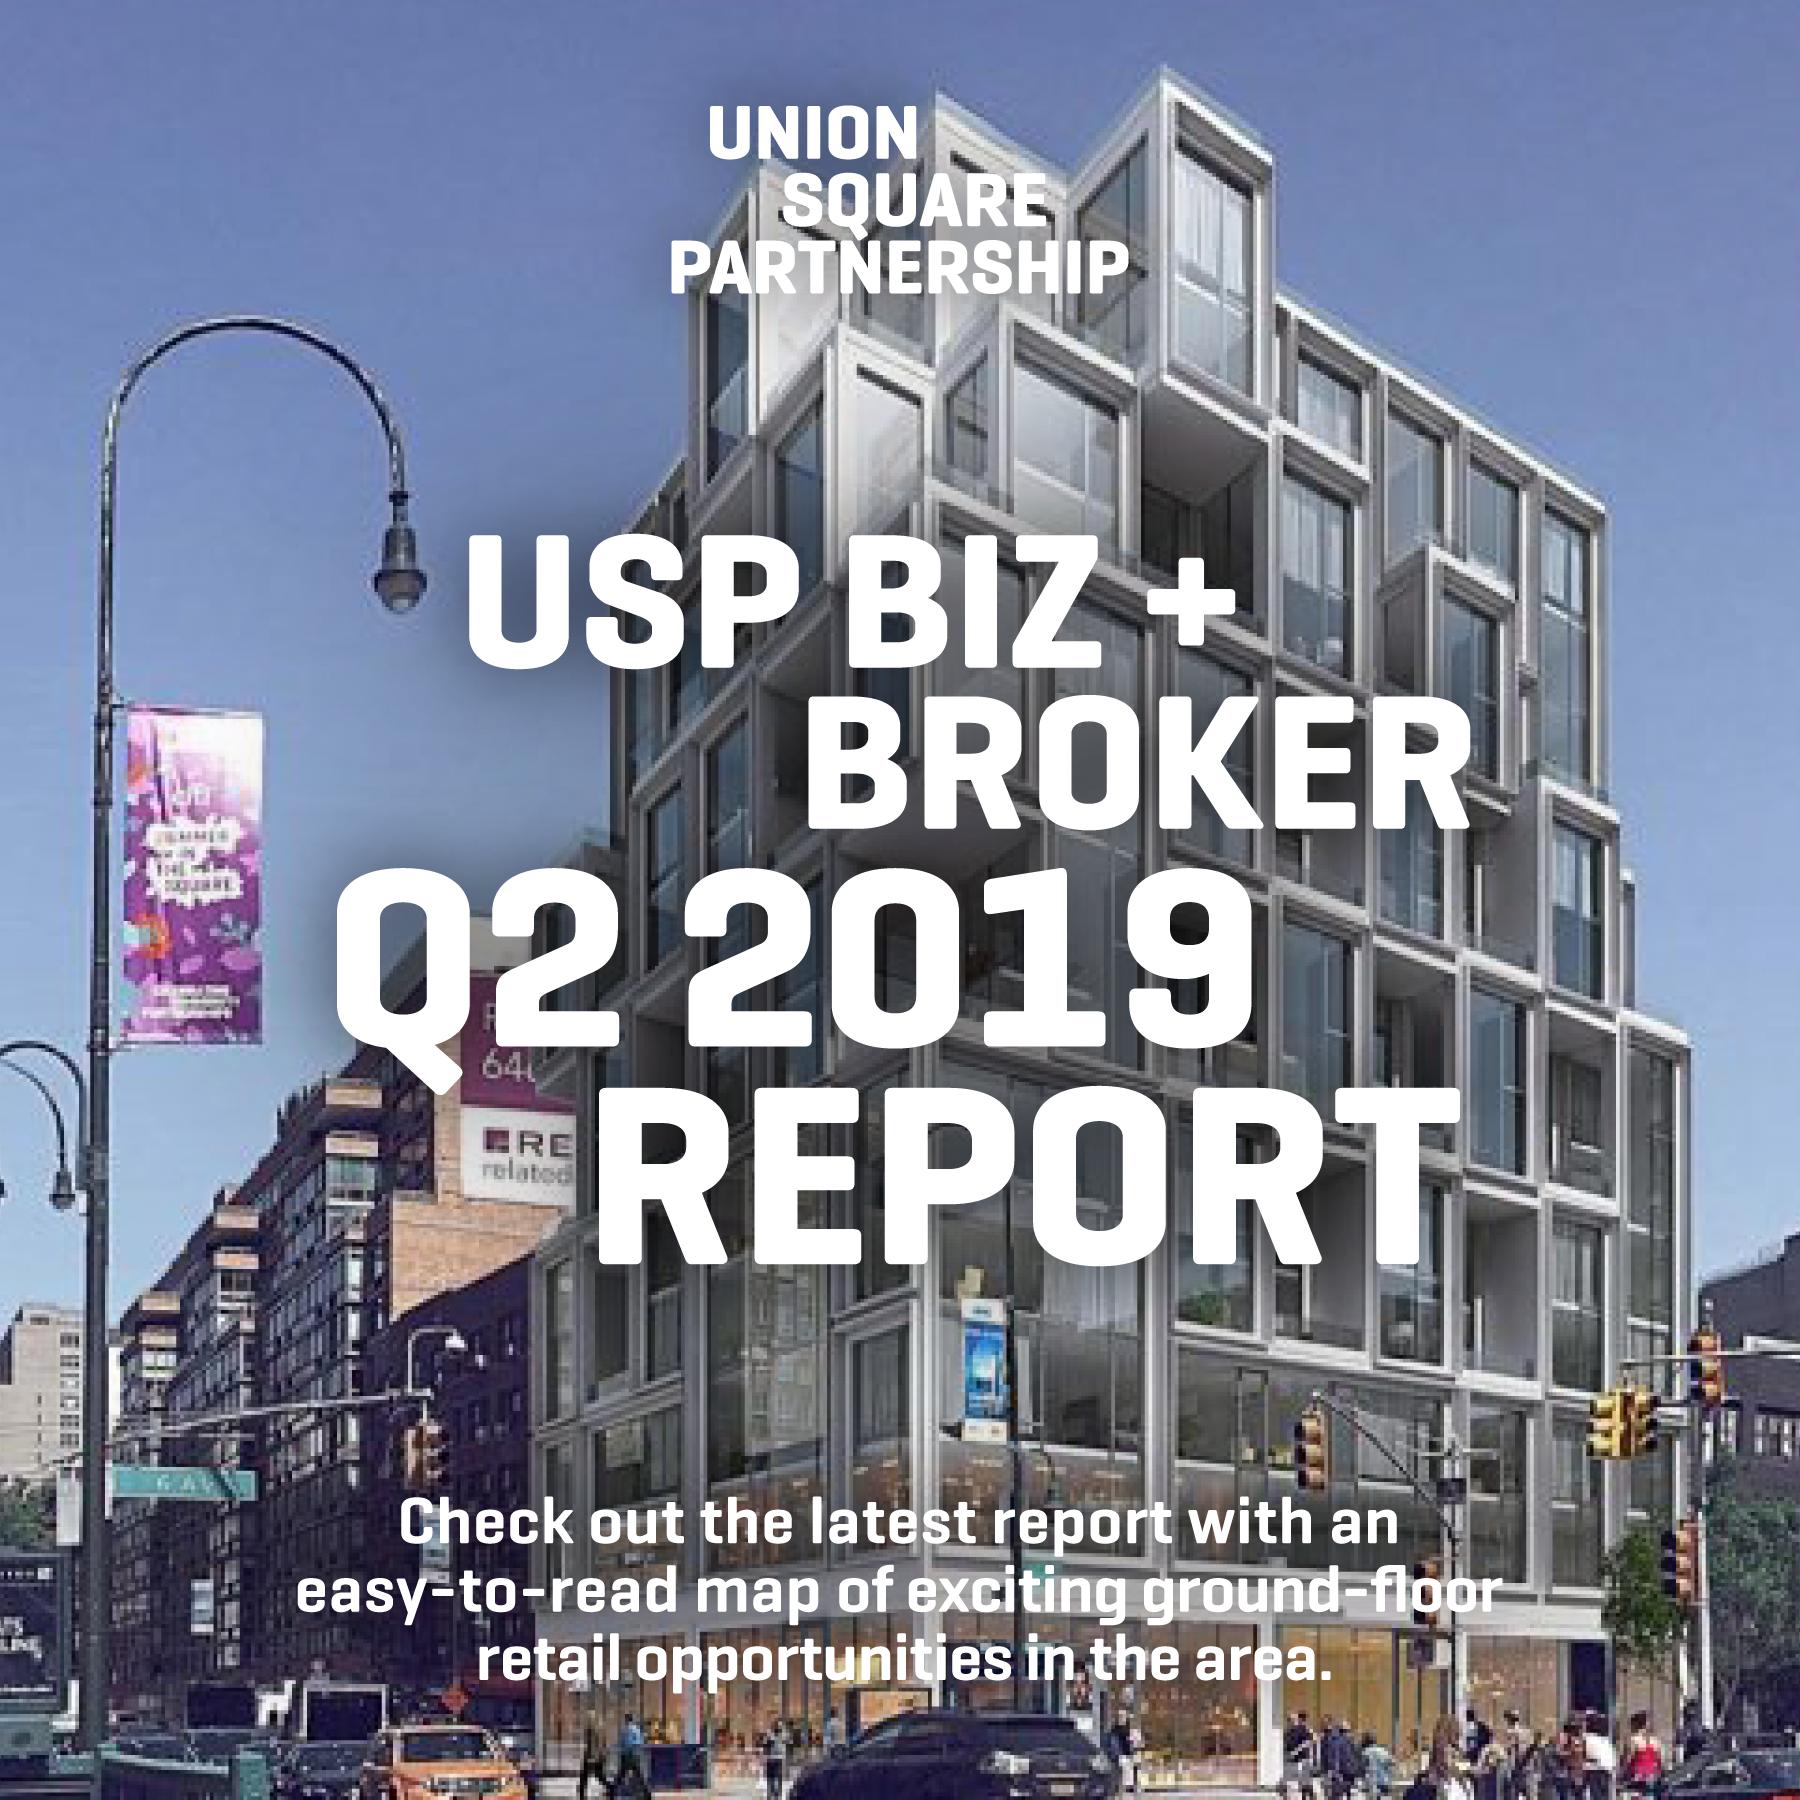 Cover-Image-Biz_Broker-Q2-2019.png